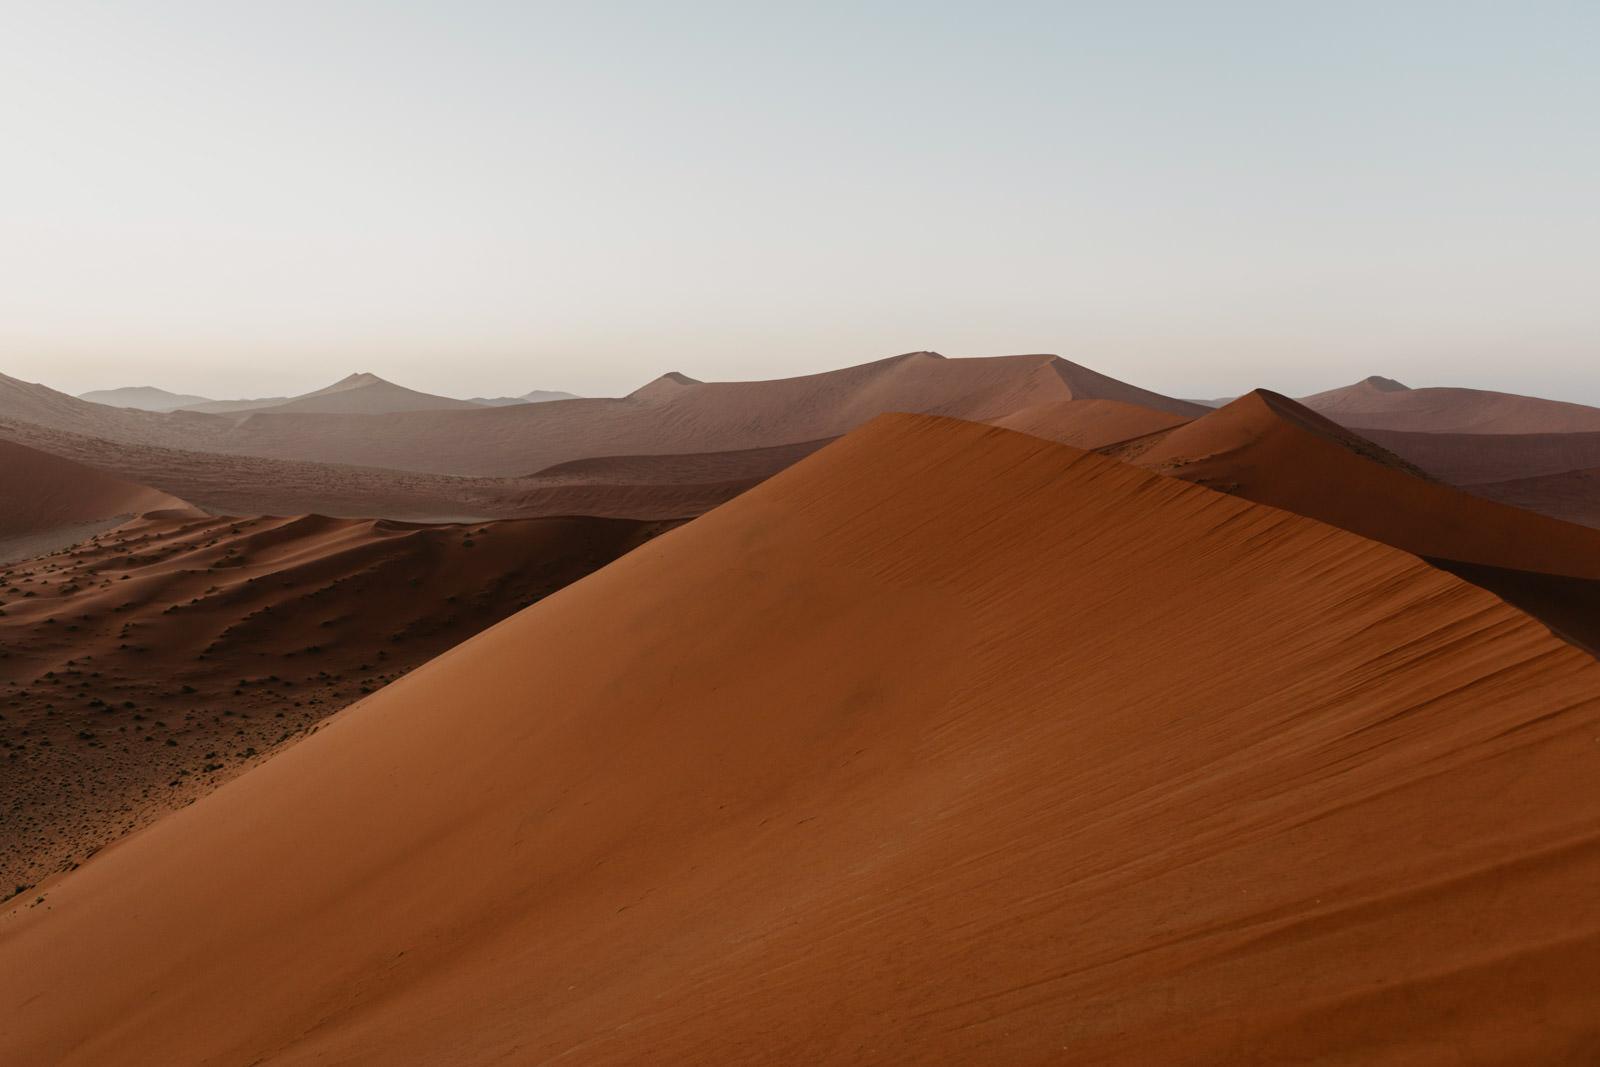 namibia_trip_rooftent_camping_roadtrip (5 von 26).jpg